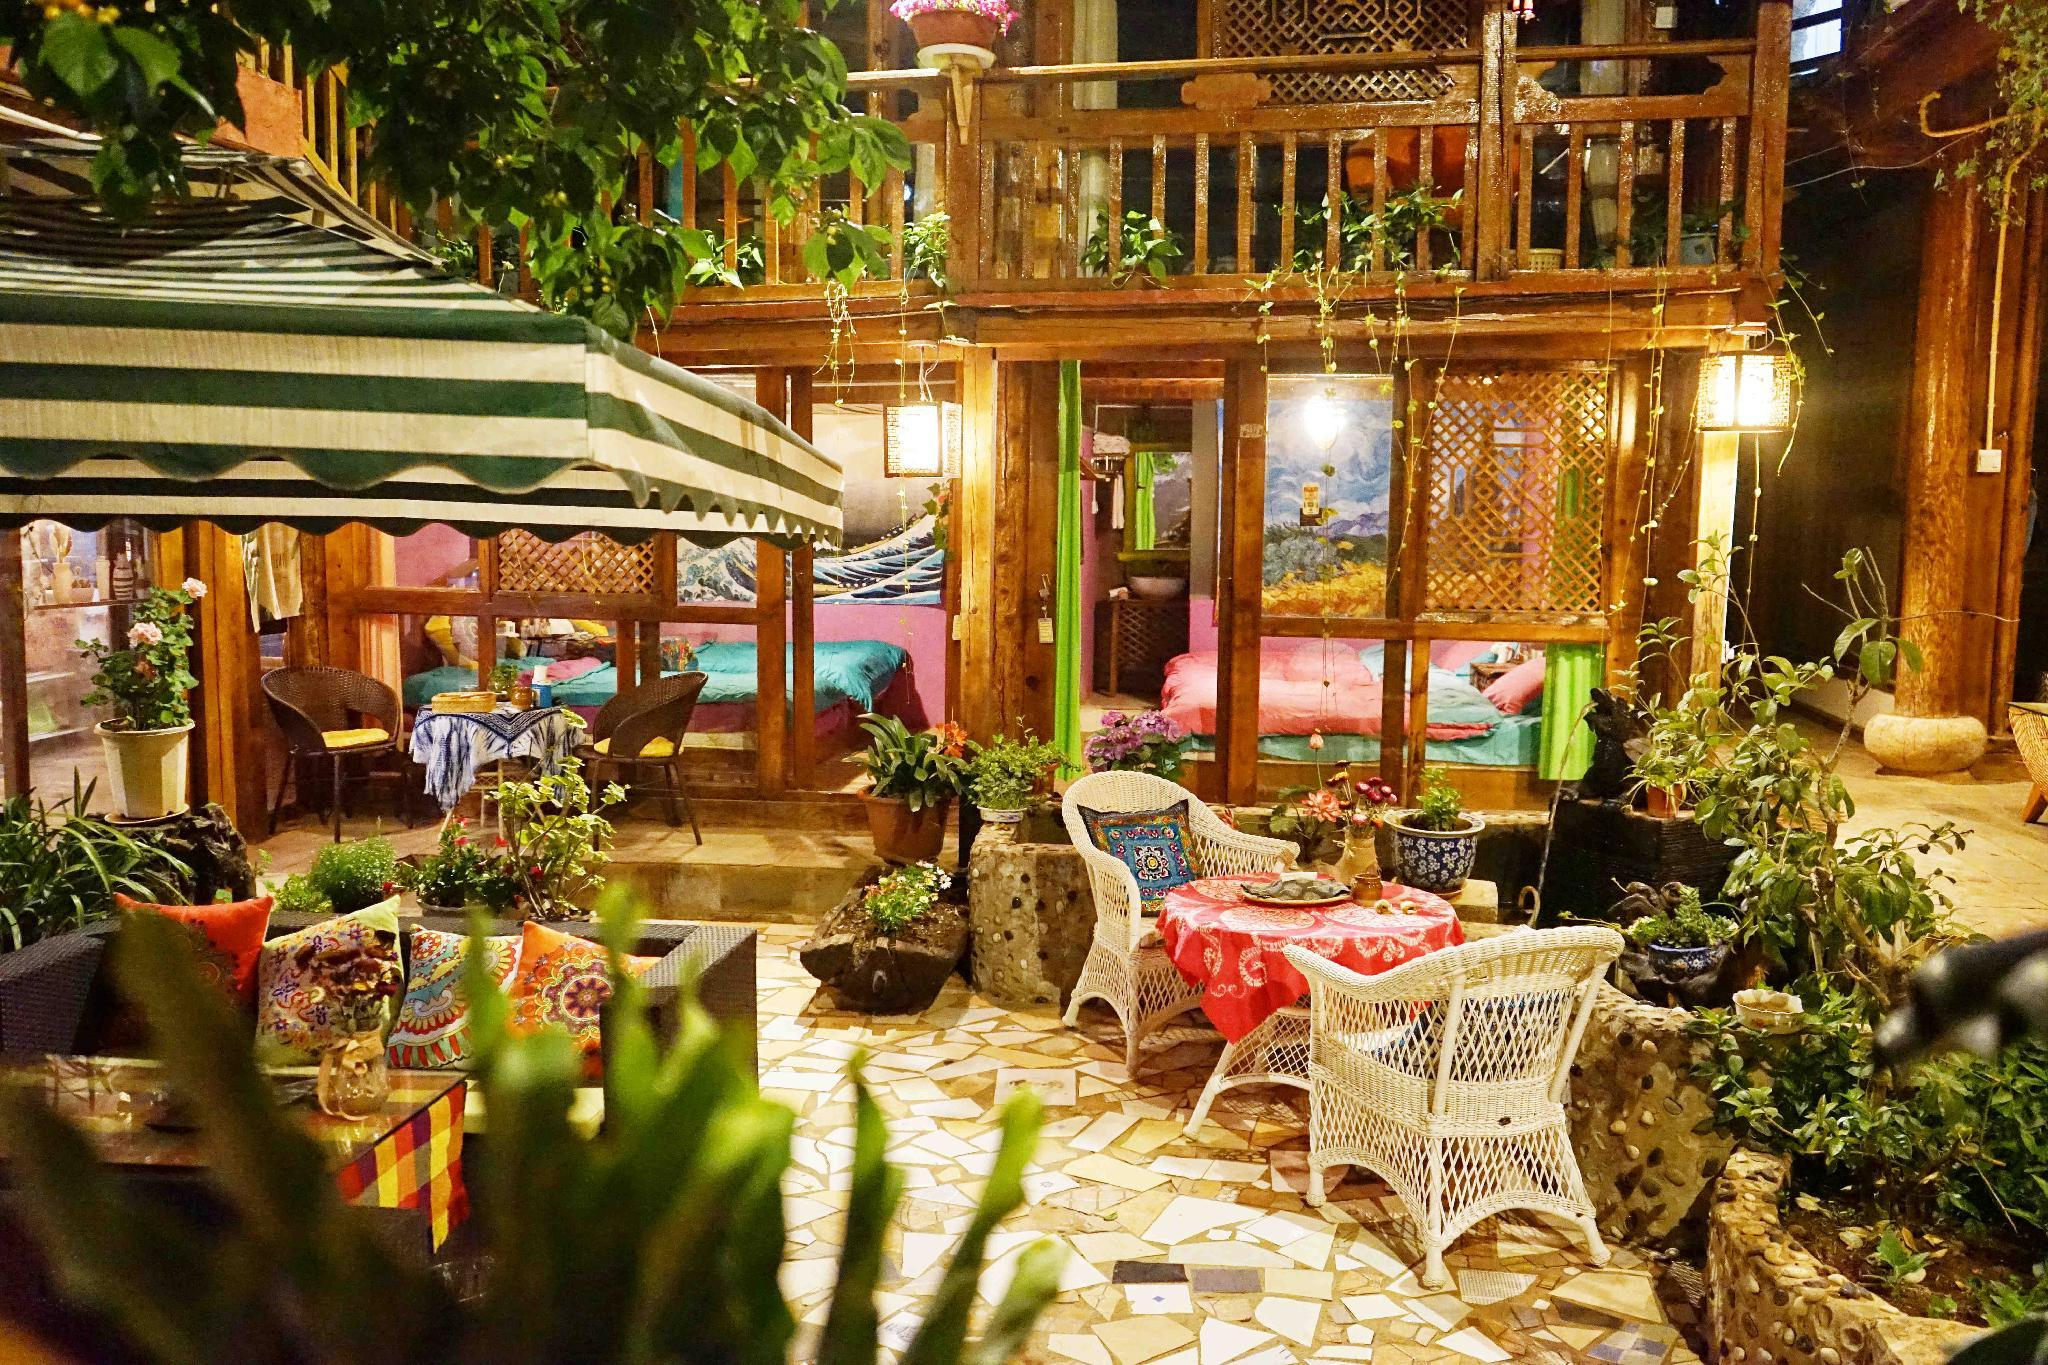 Twelfth Night Lijiang Shuhe Old Town King Bed Room